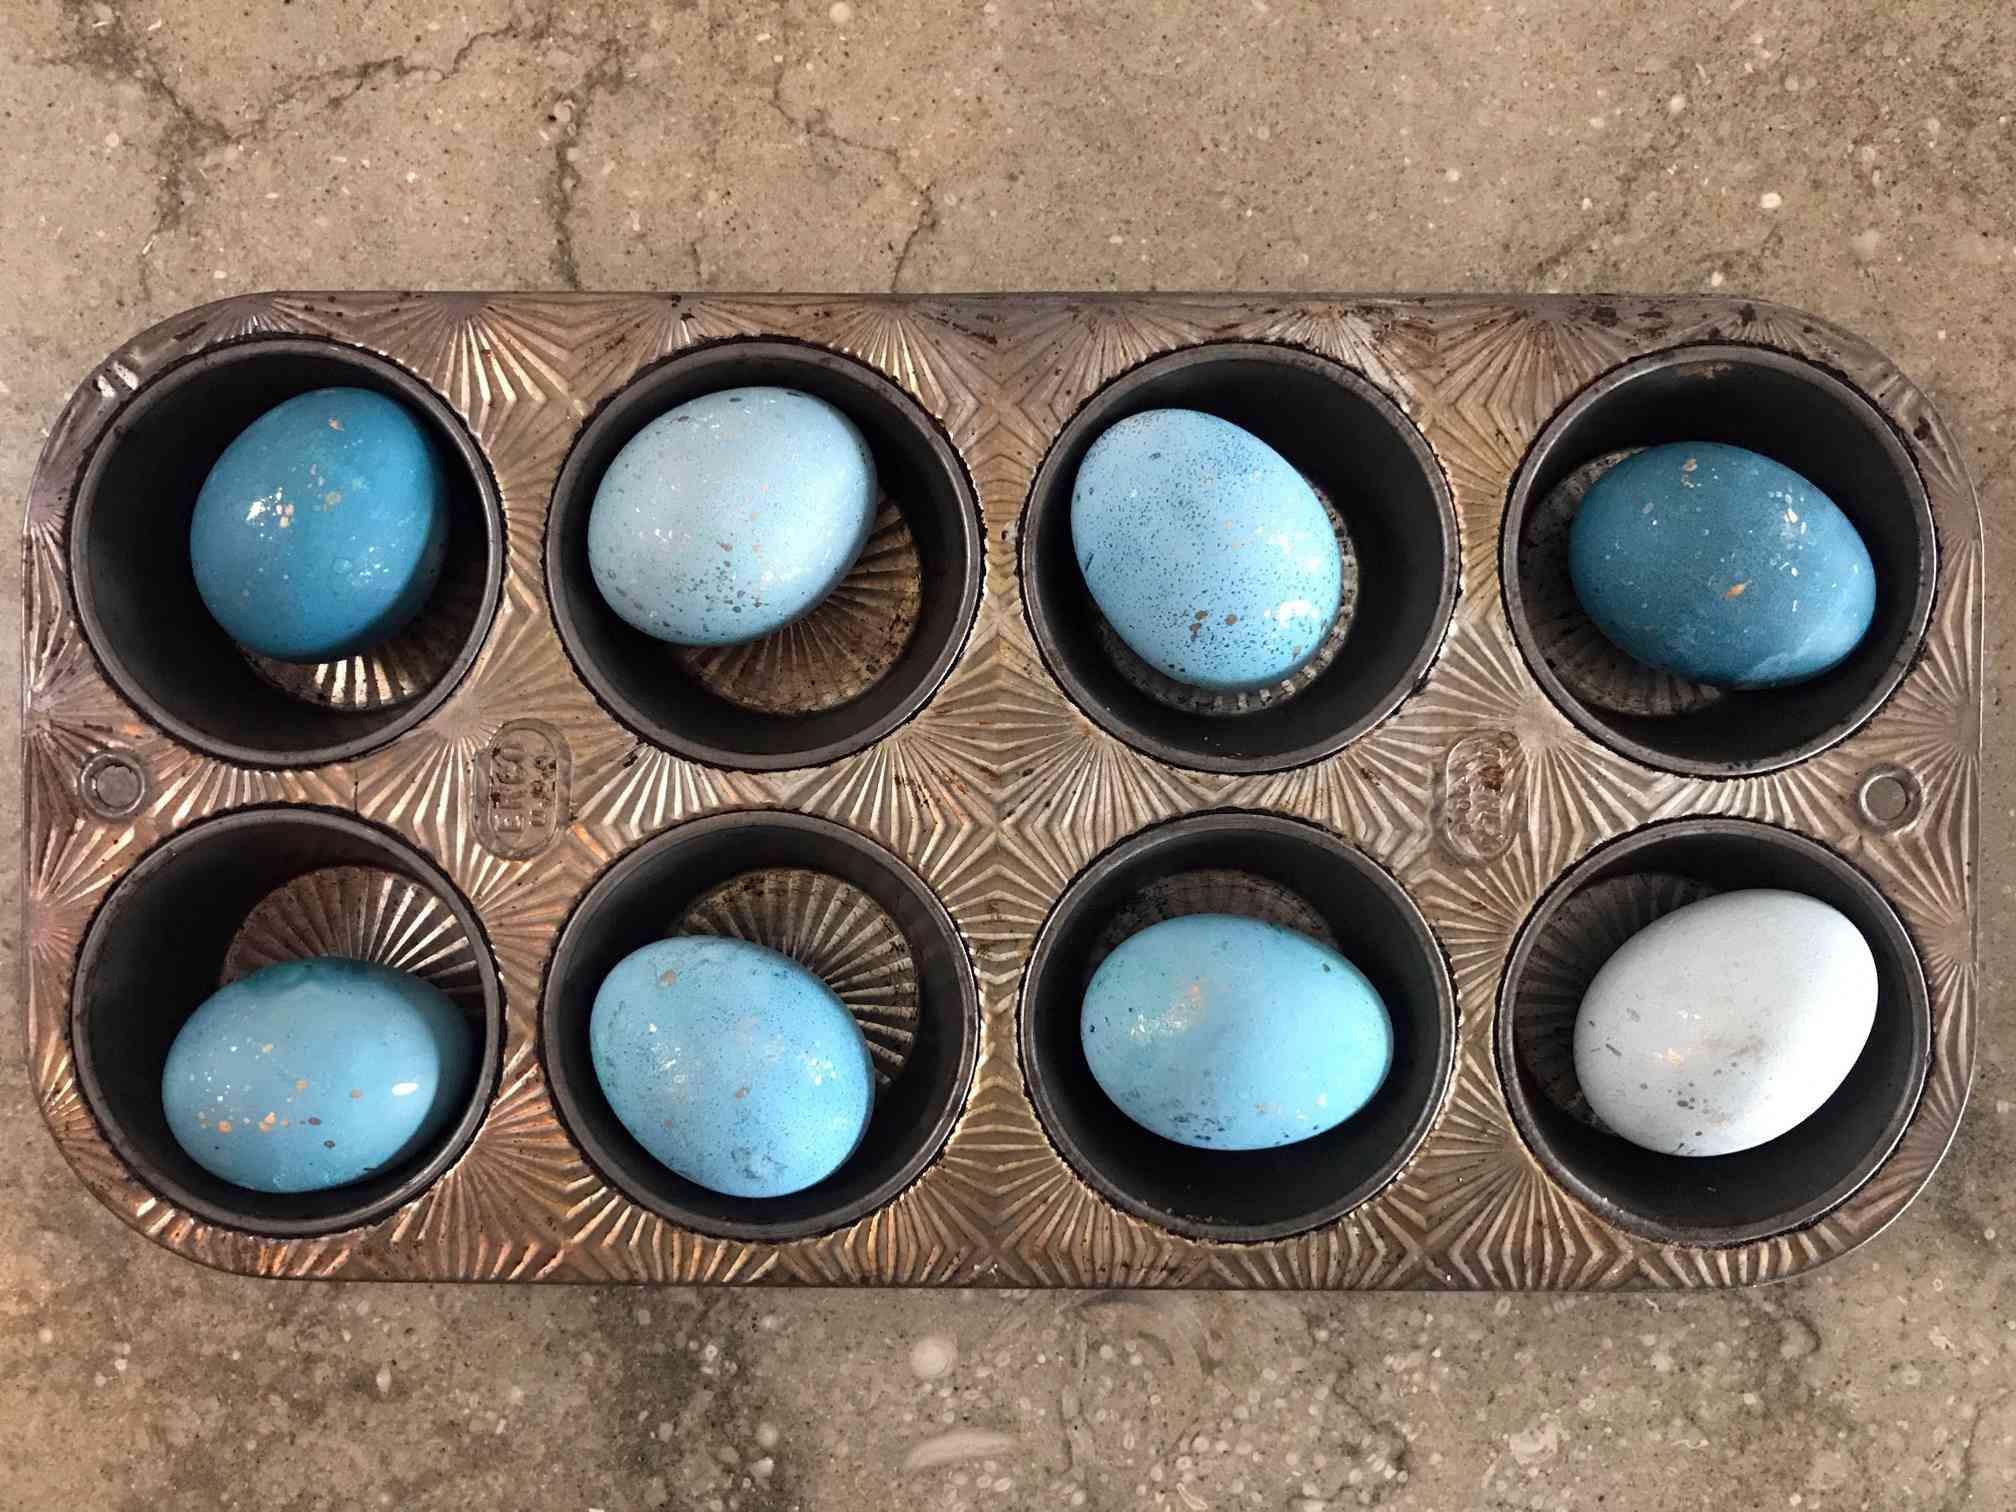 Cabbage eggs